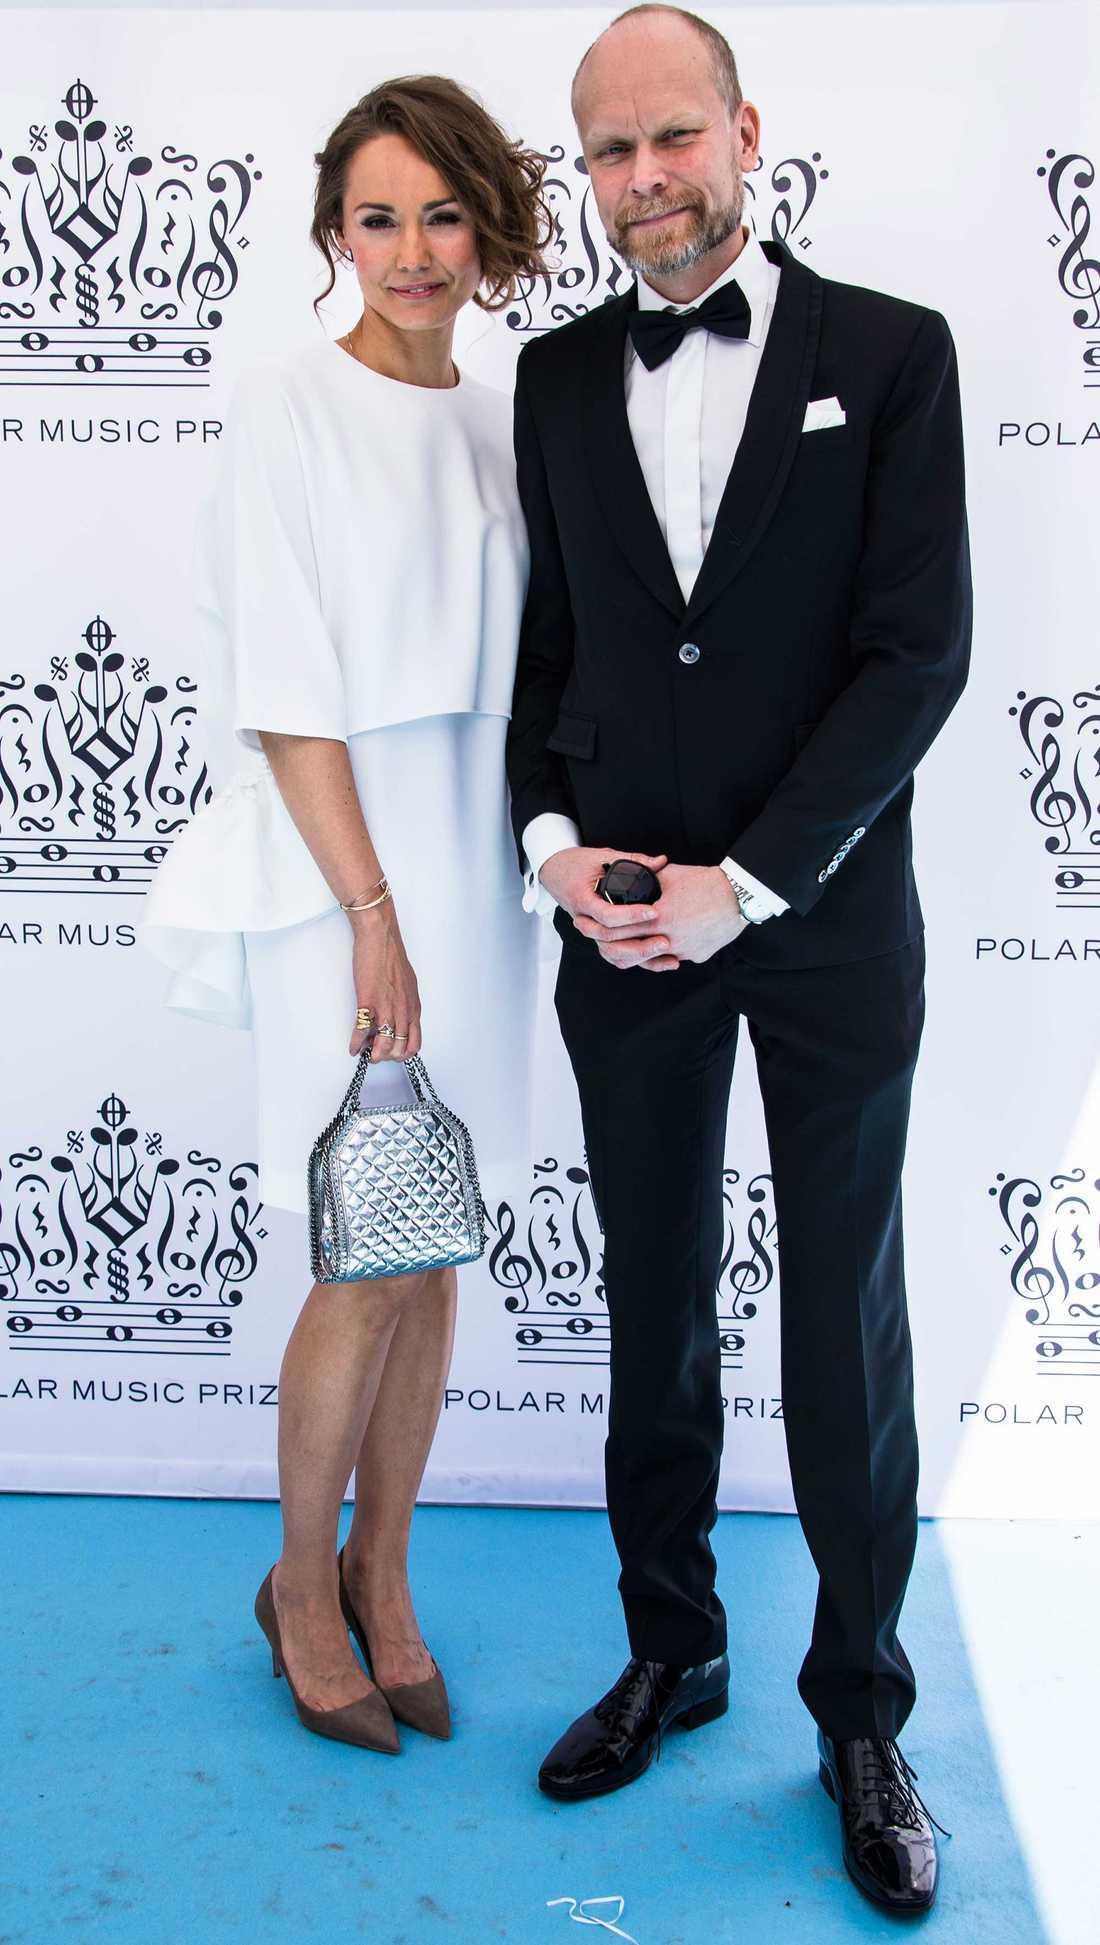 Carina Berg och Kristian Luuk skiljer sig.